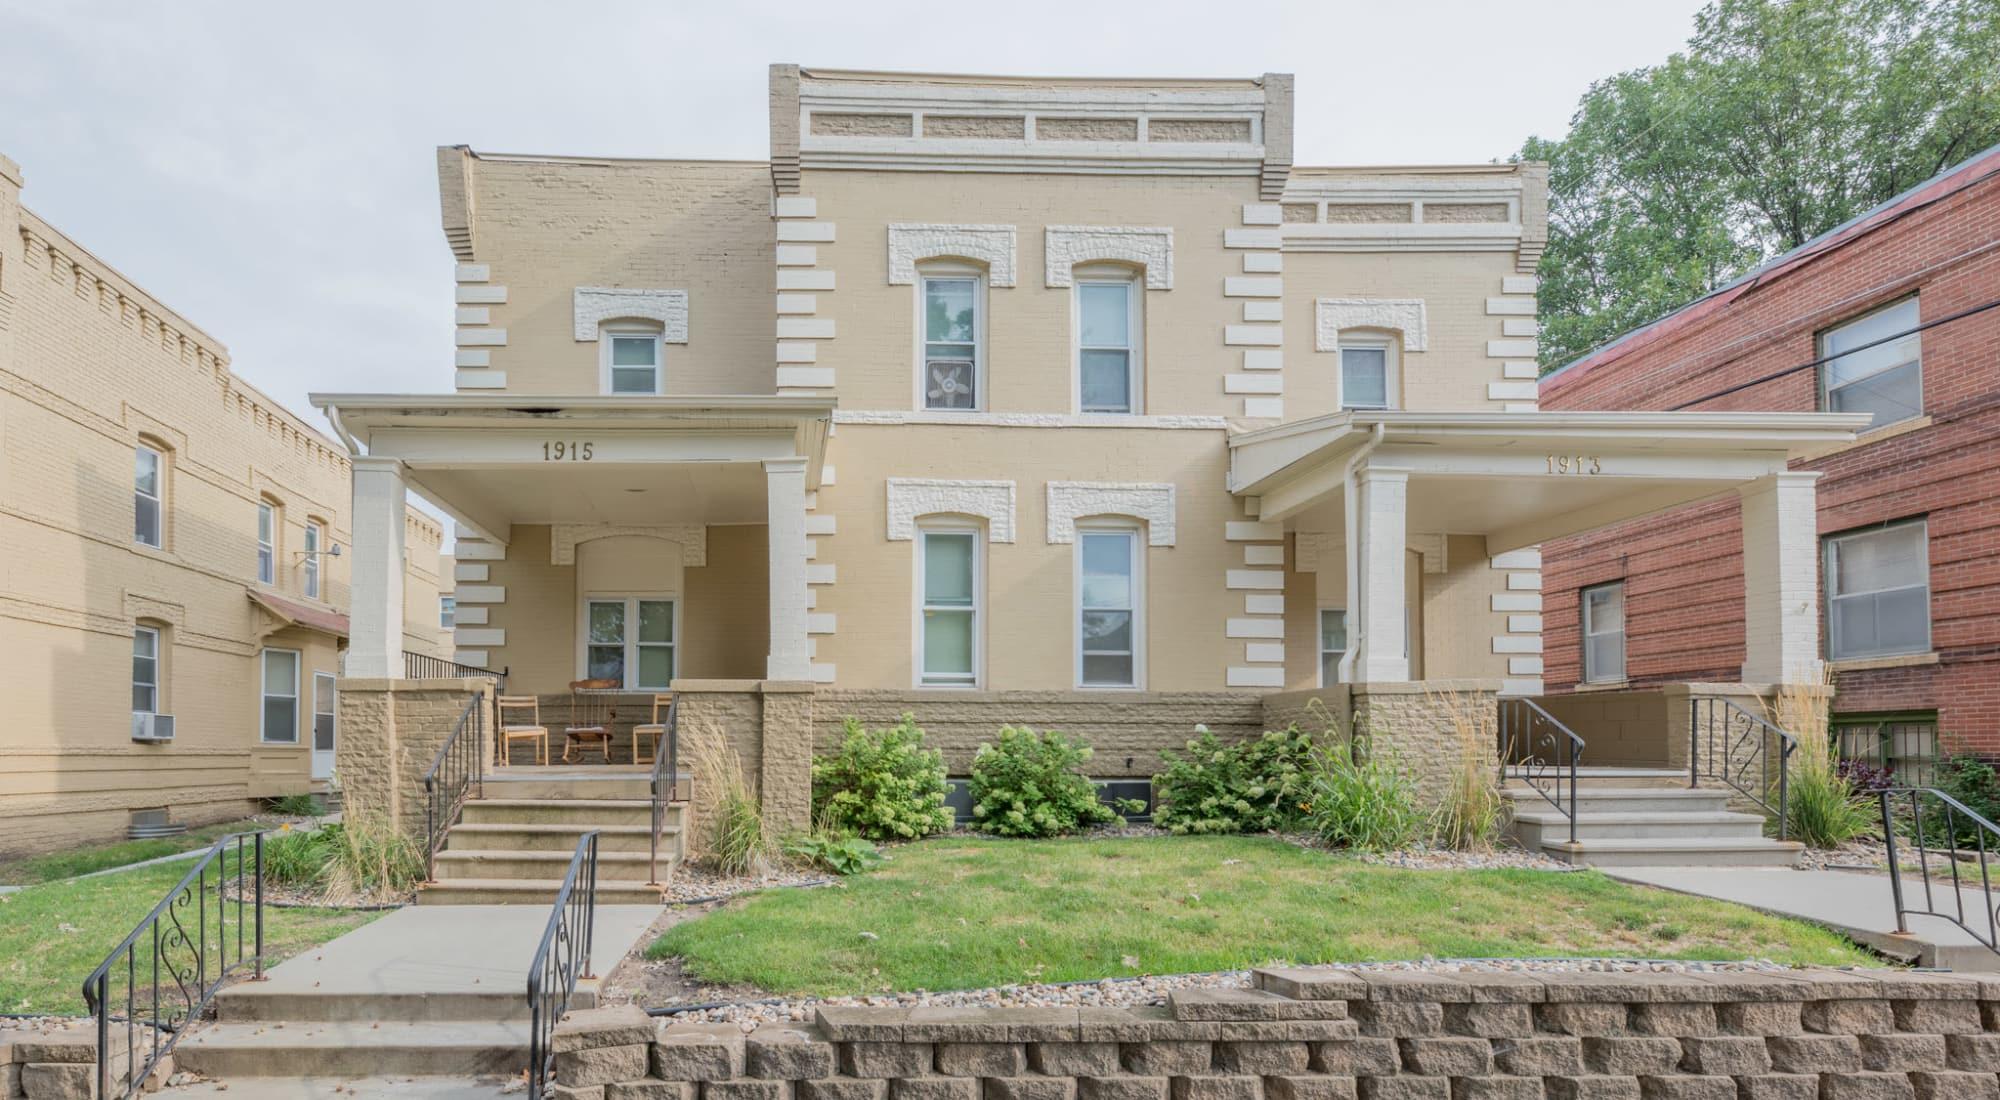 Pleasant Street Apartments in Des Moines, Iowa